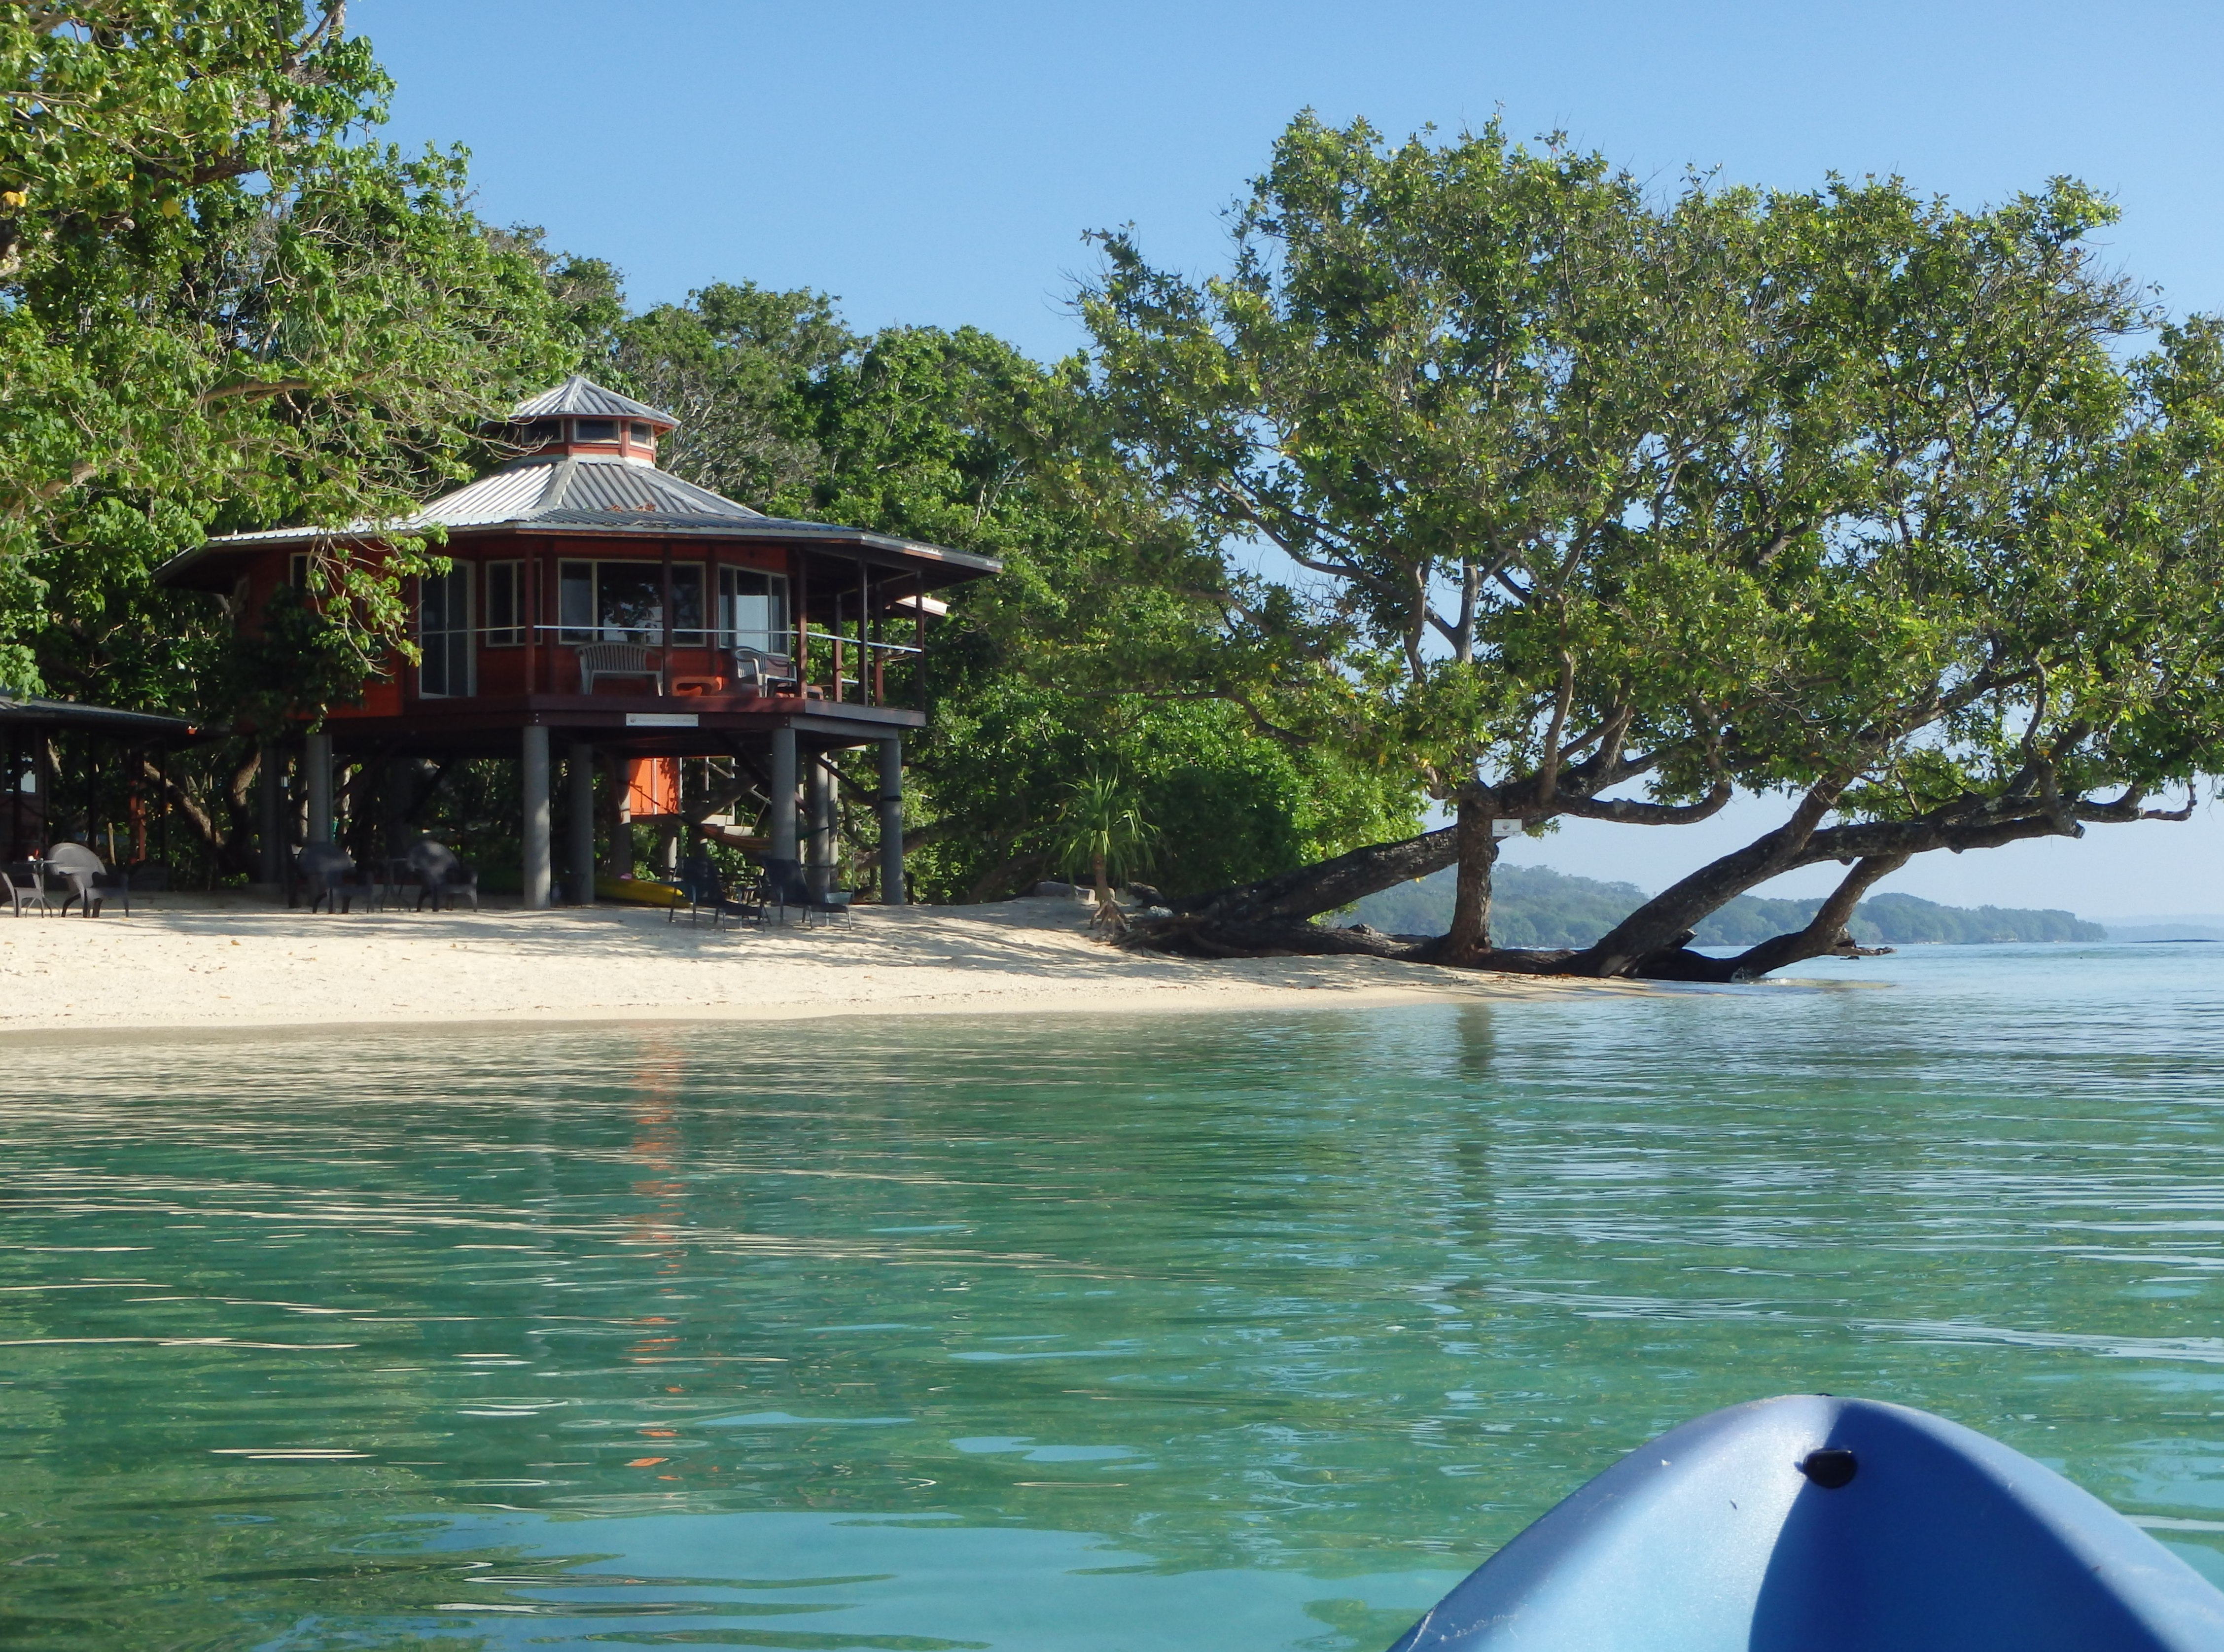 Frangipani beach cabana, from kayak